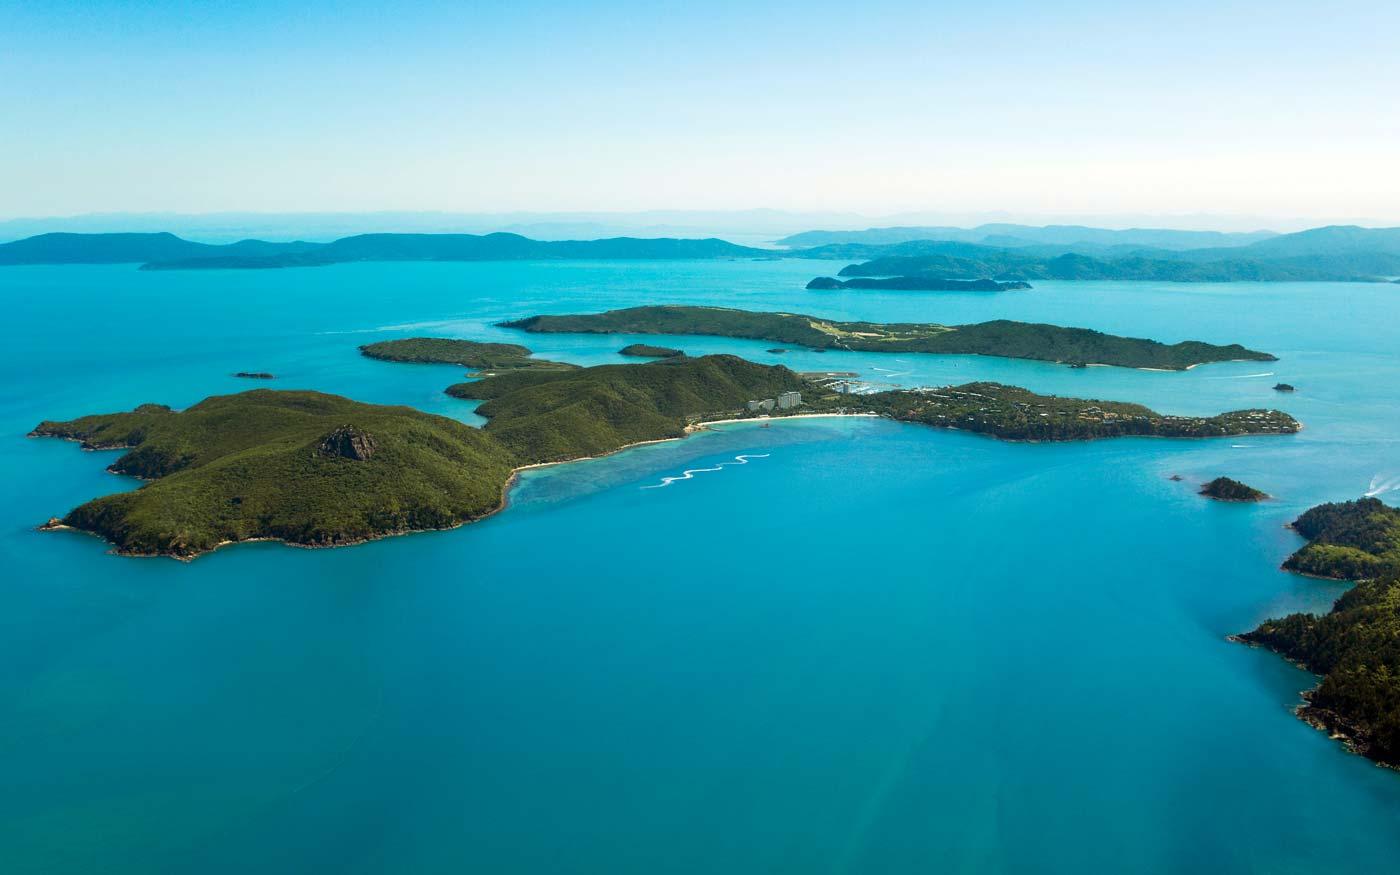 scenery-hamilton-island-aerial.jpg